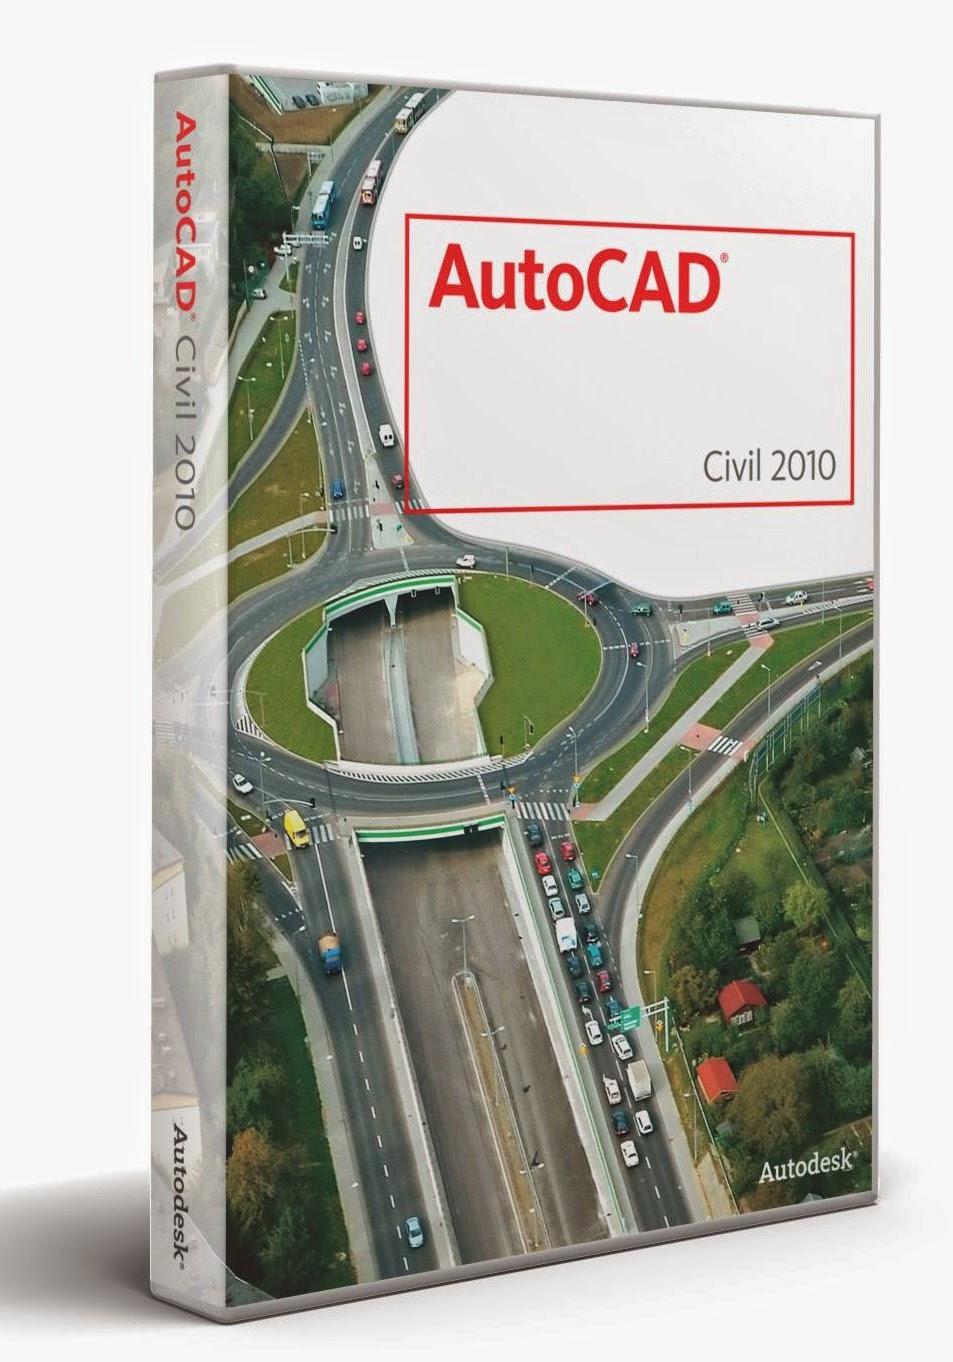 Autodesk autocad v2017 win64 iso raintree